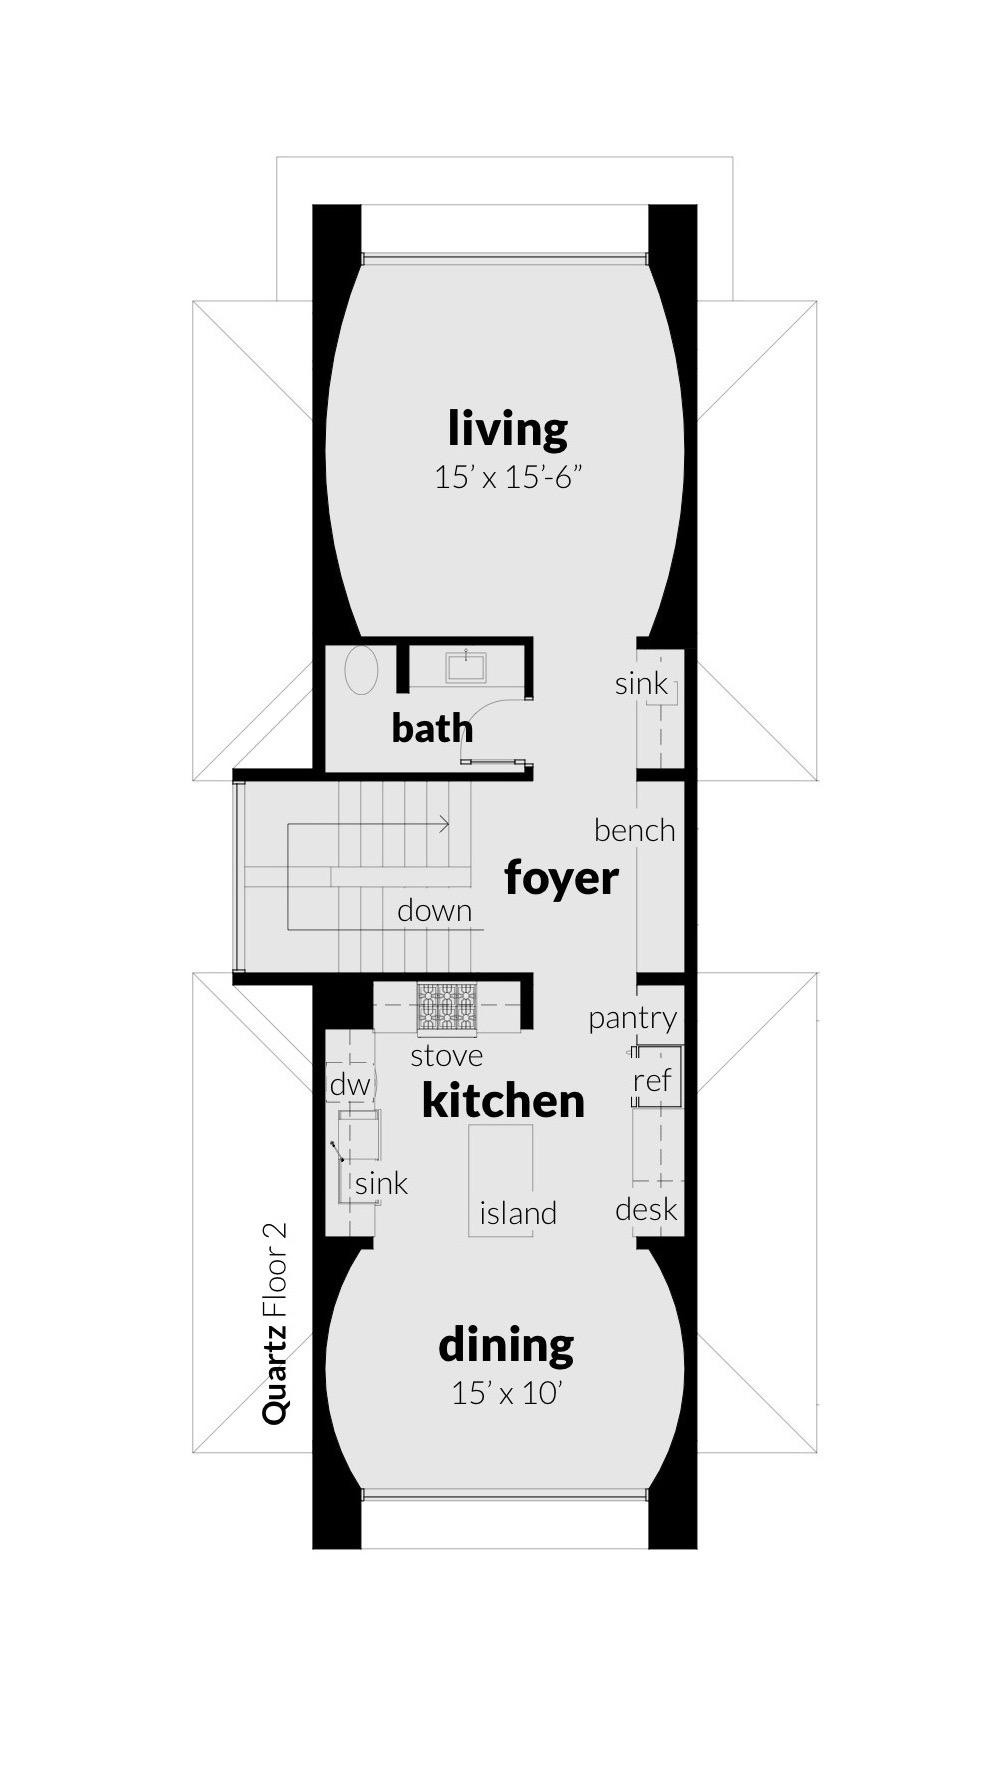 Floor 2, Quartz House Plan by Tyree House Plans